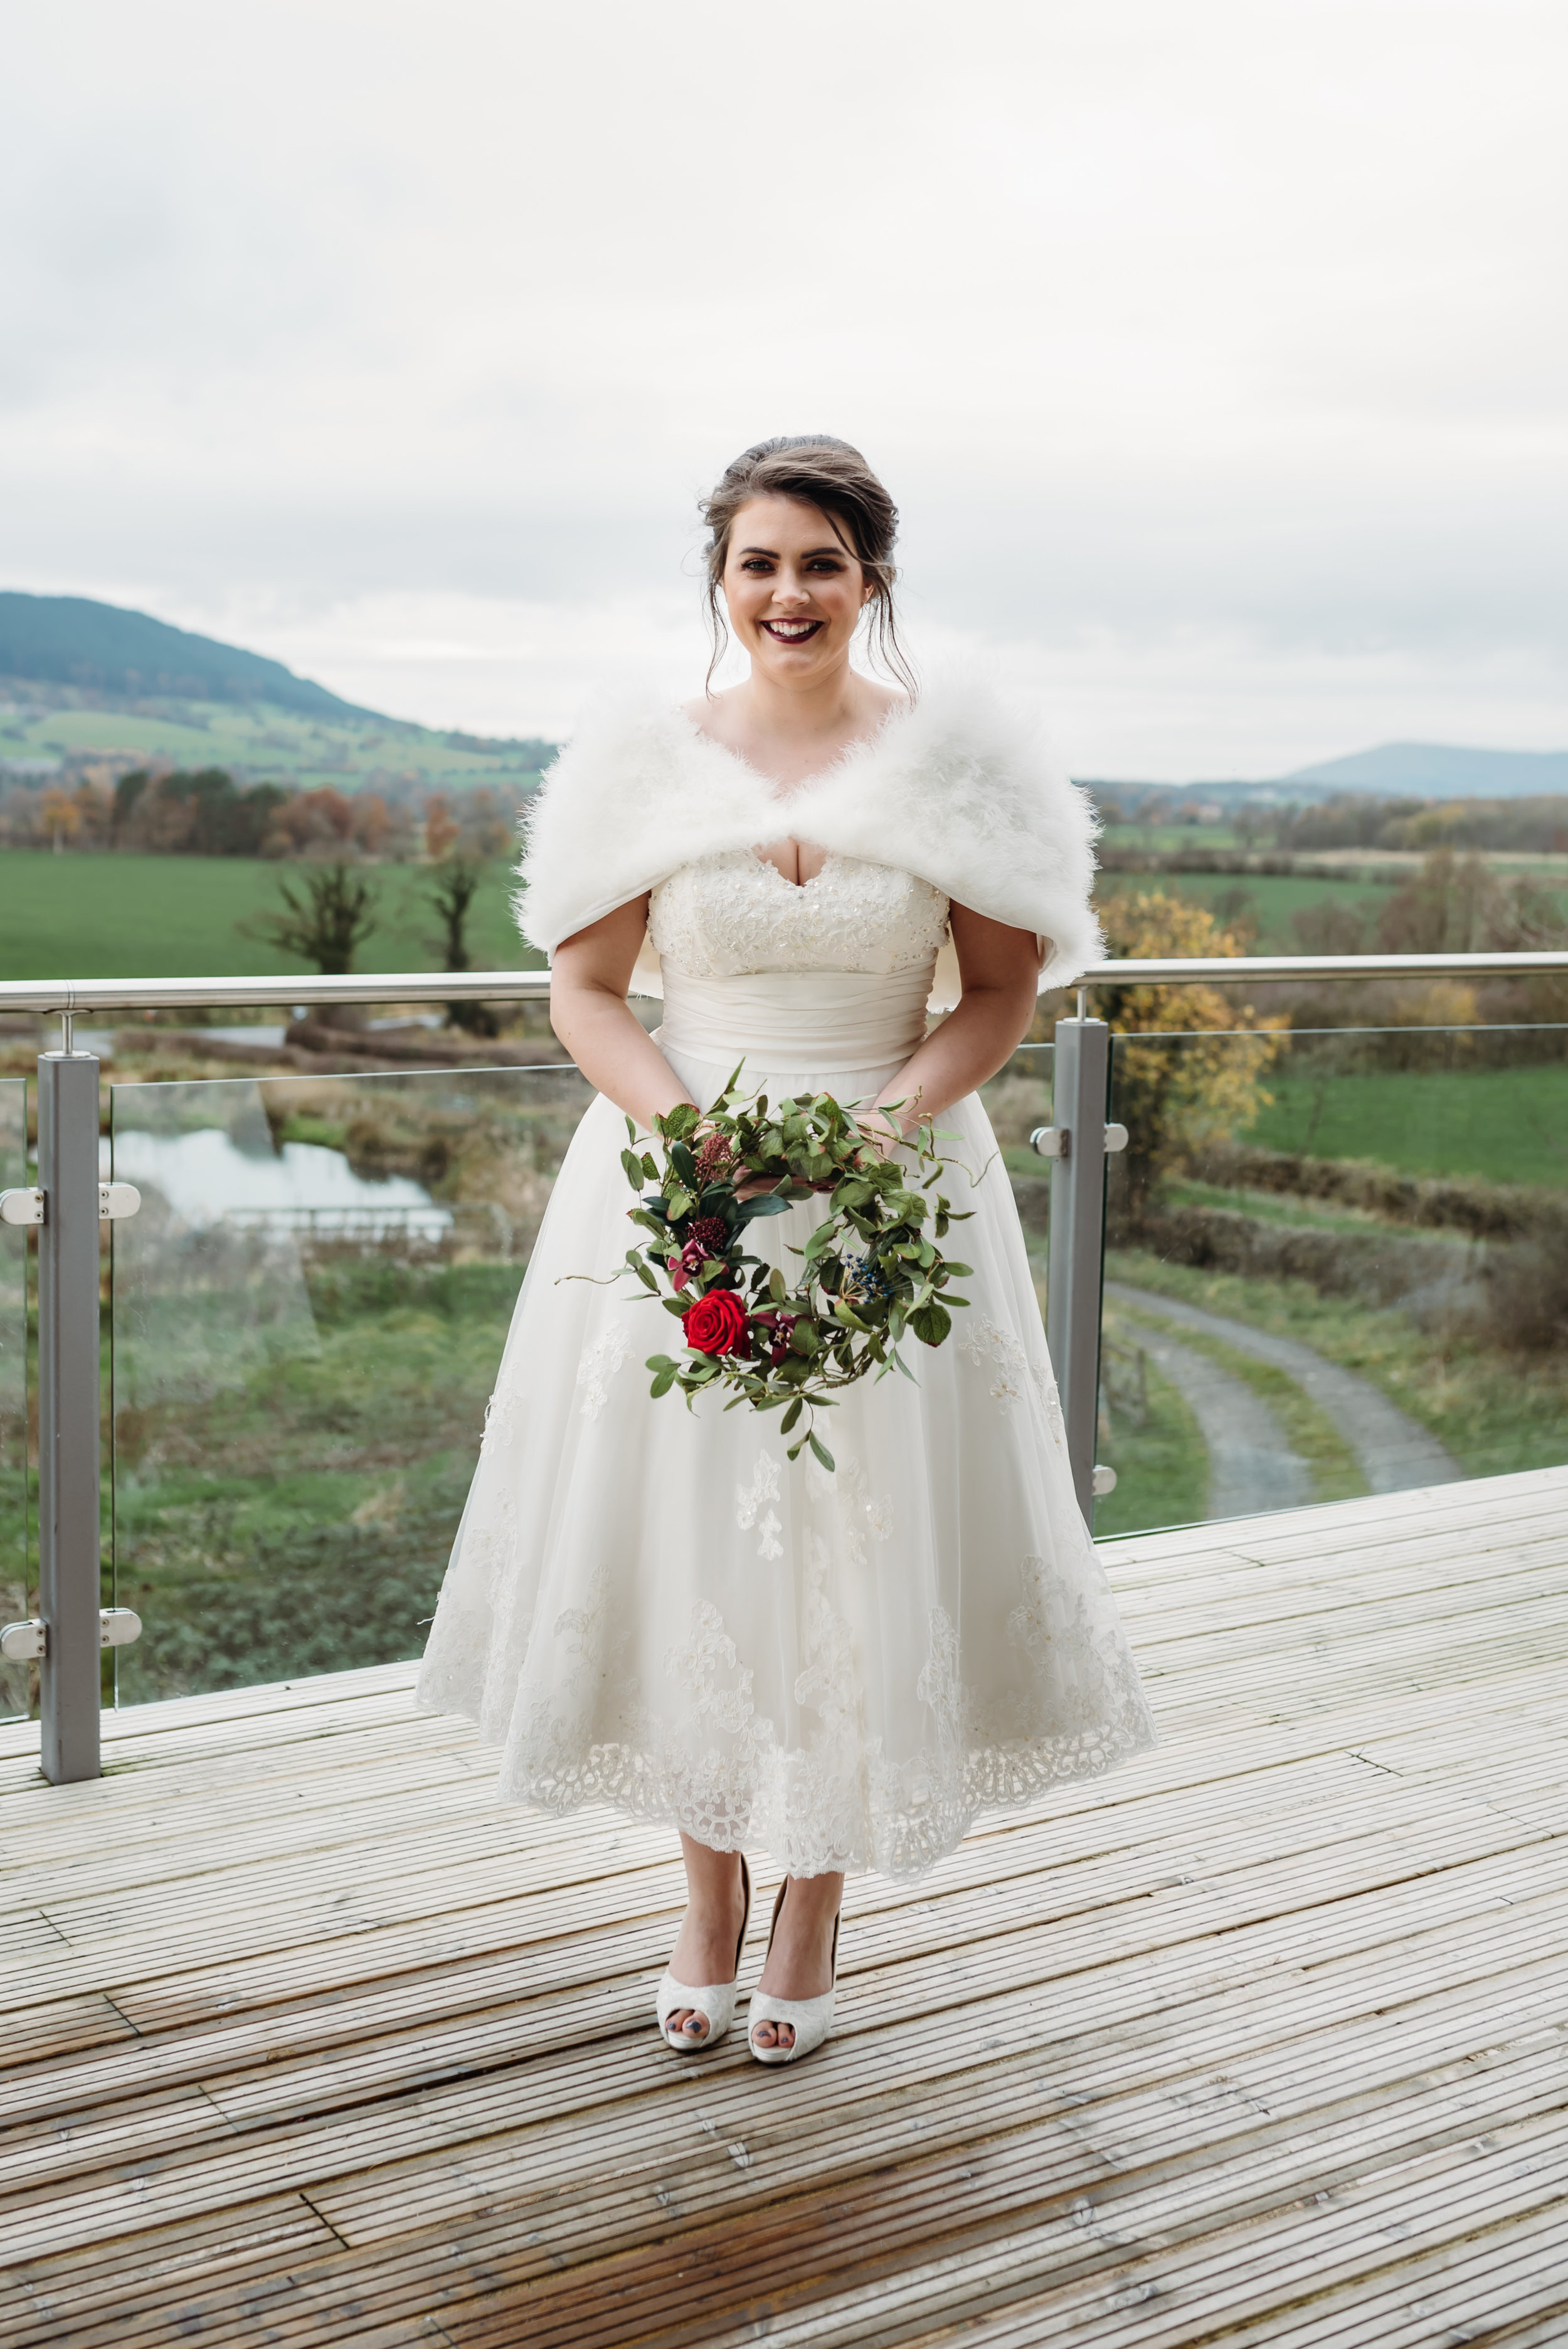 Daisy Chain Photography - lancashire wedding photographer